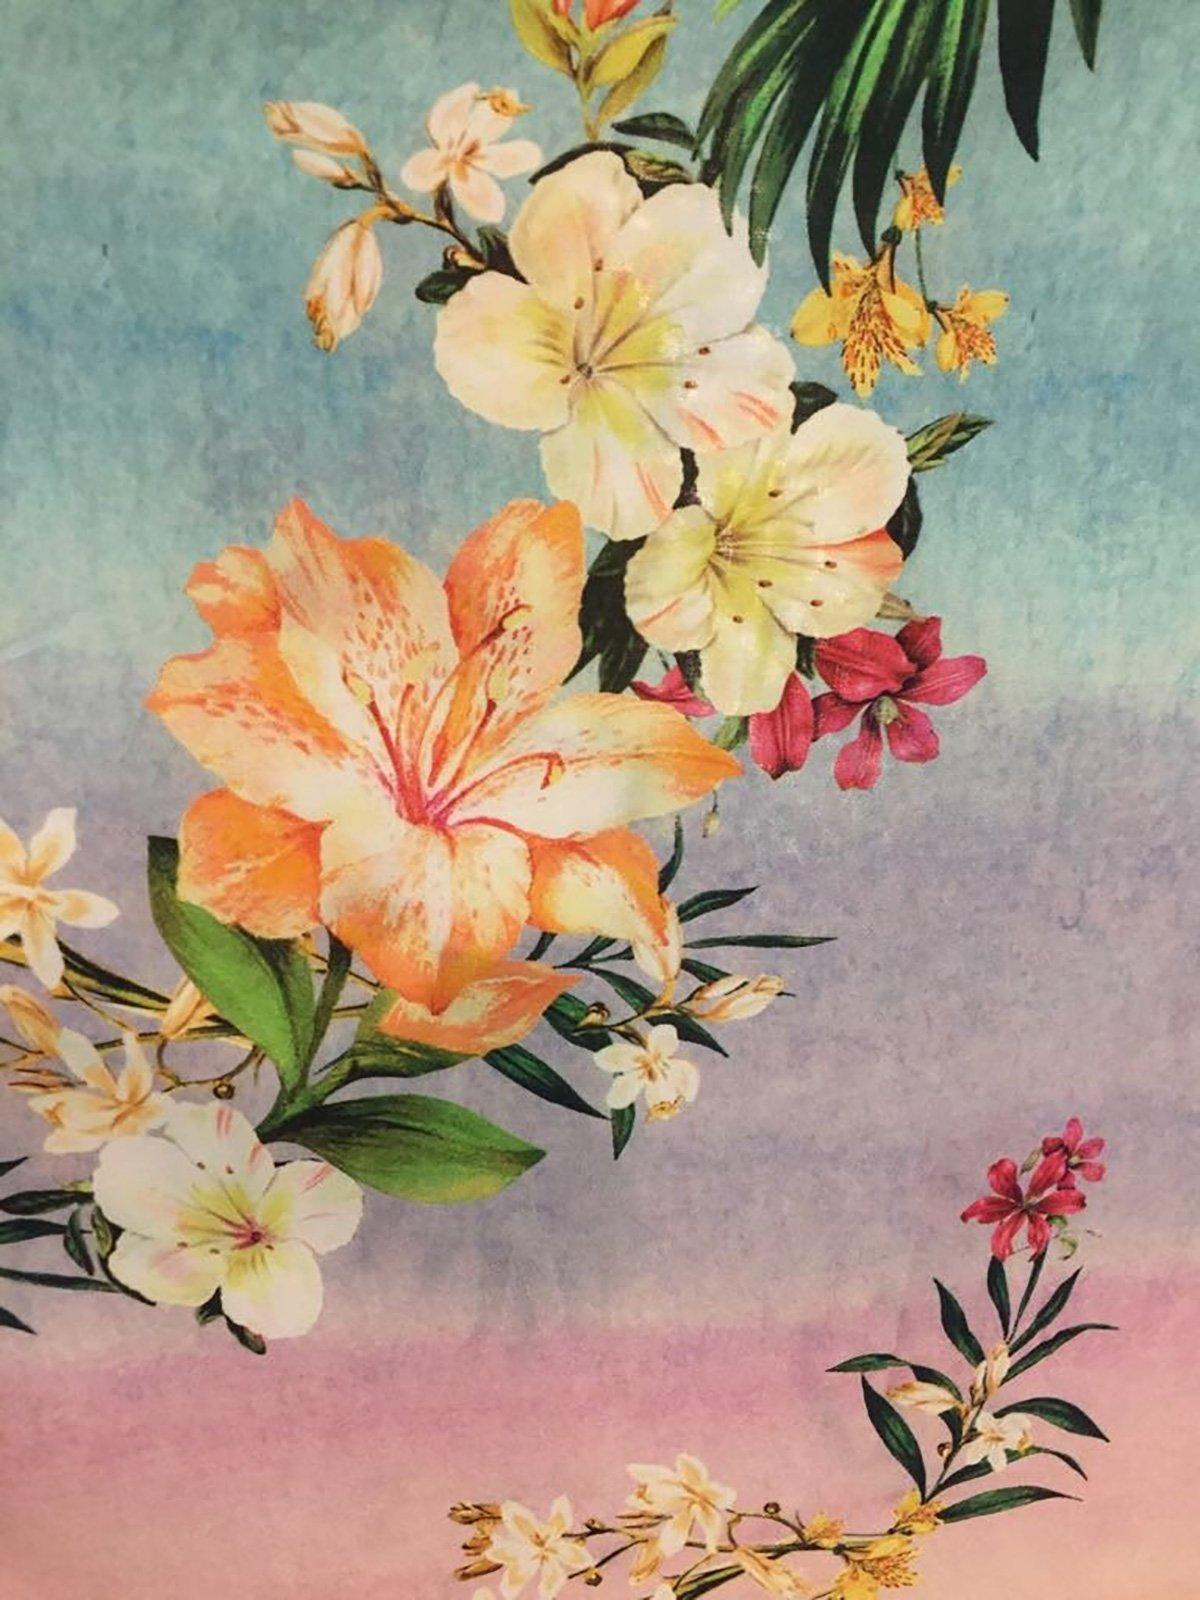 9ae0c3bc54 ... Long pastel gradient floral beach dress - VESTIDO LONGO HORIZONTE  FLORIDO ...